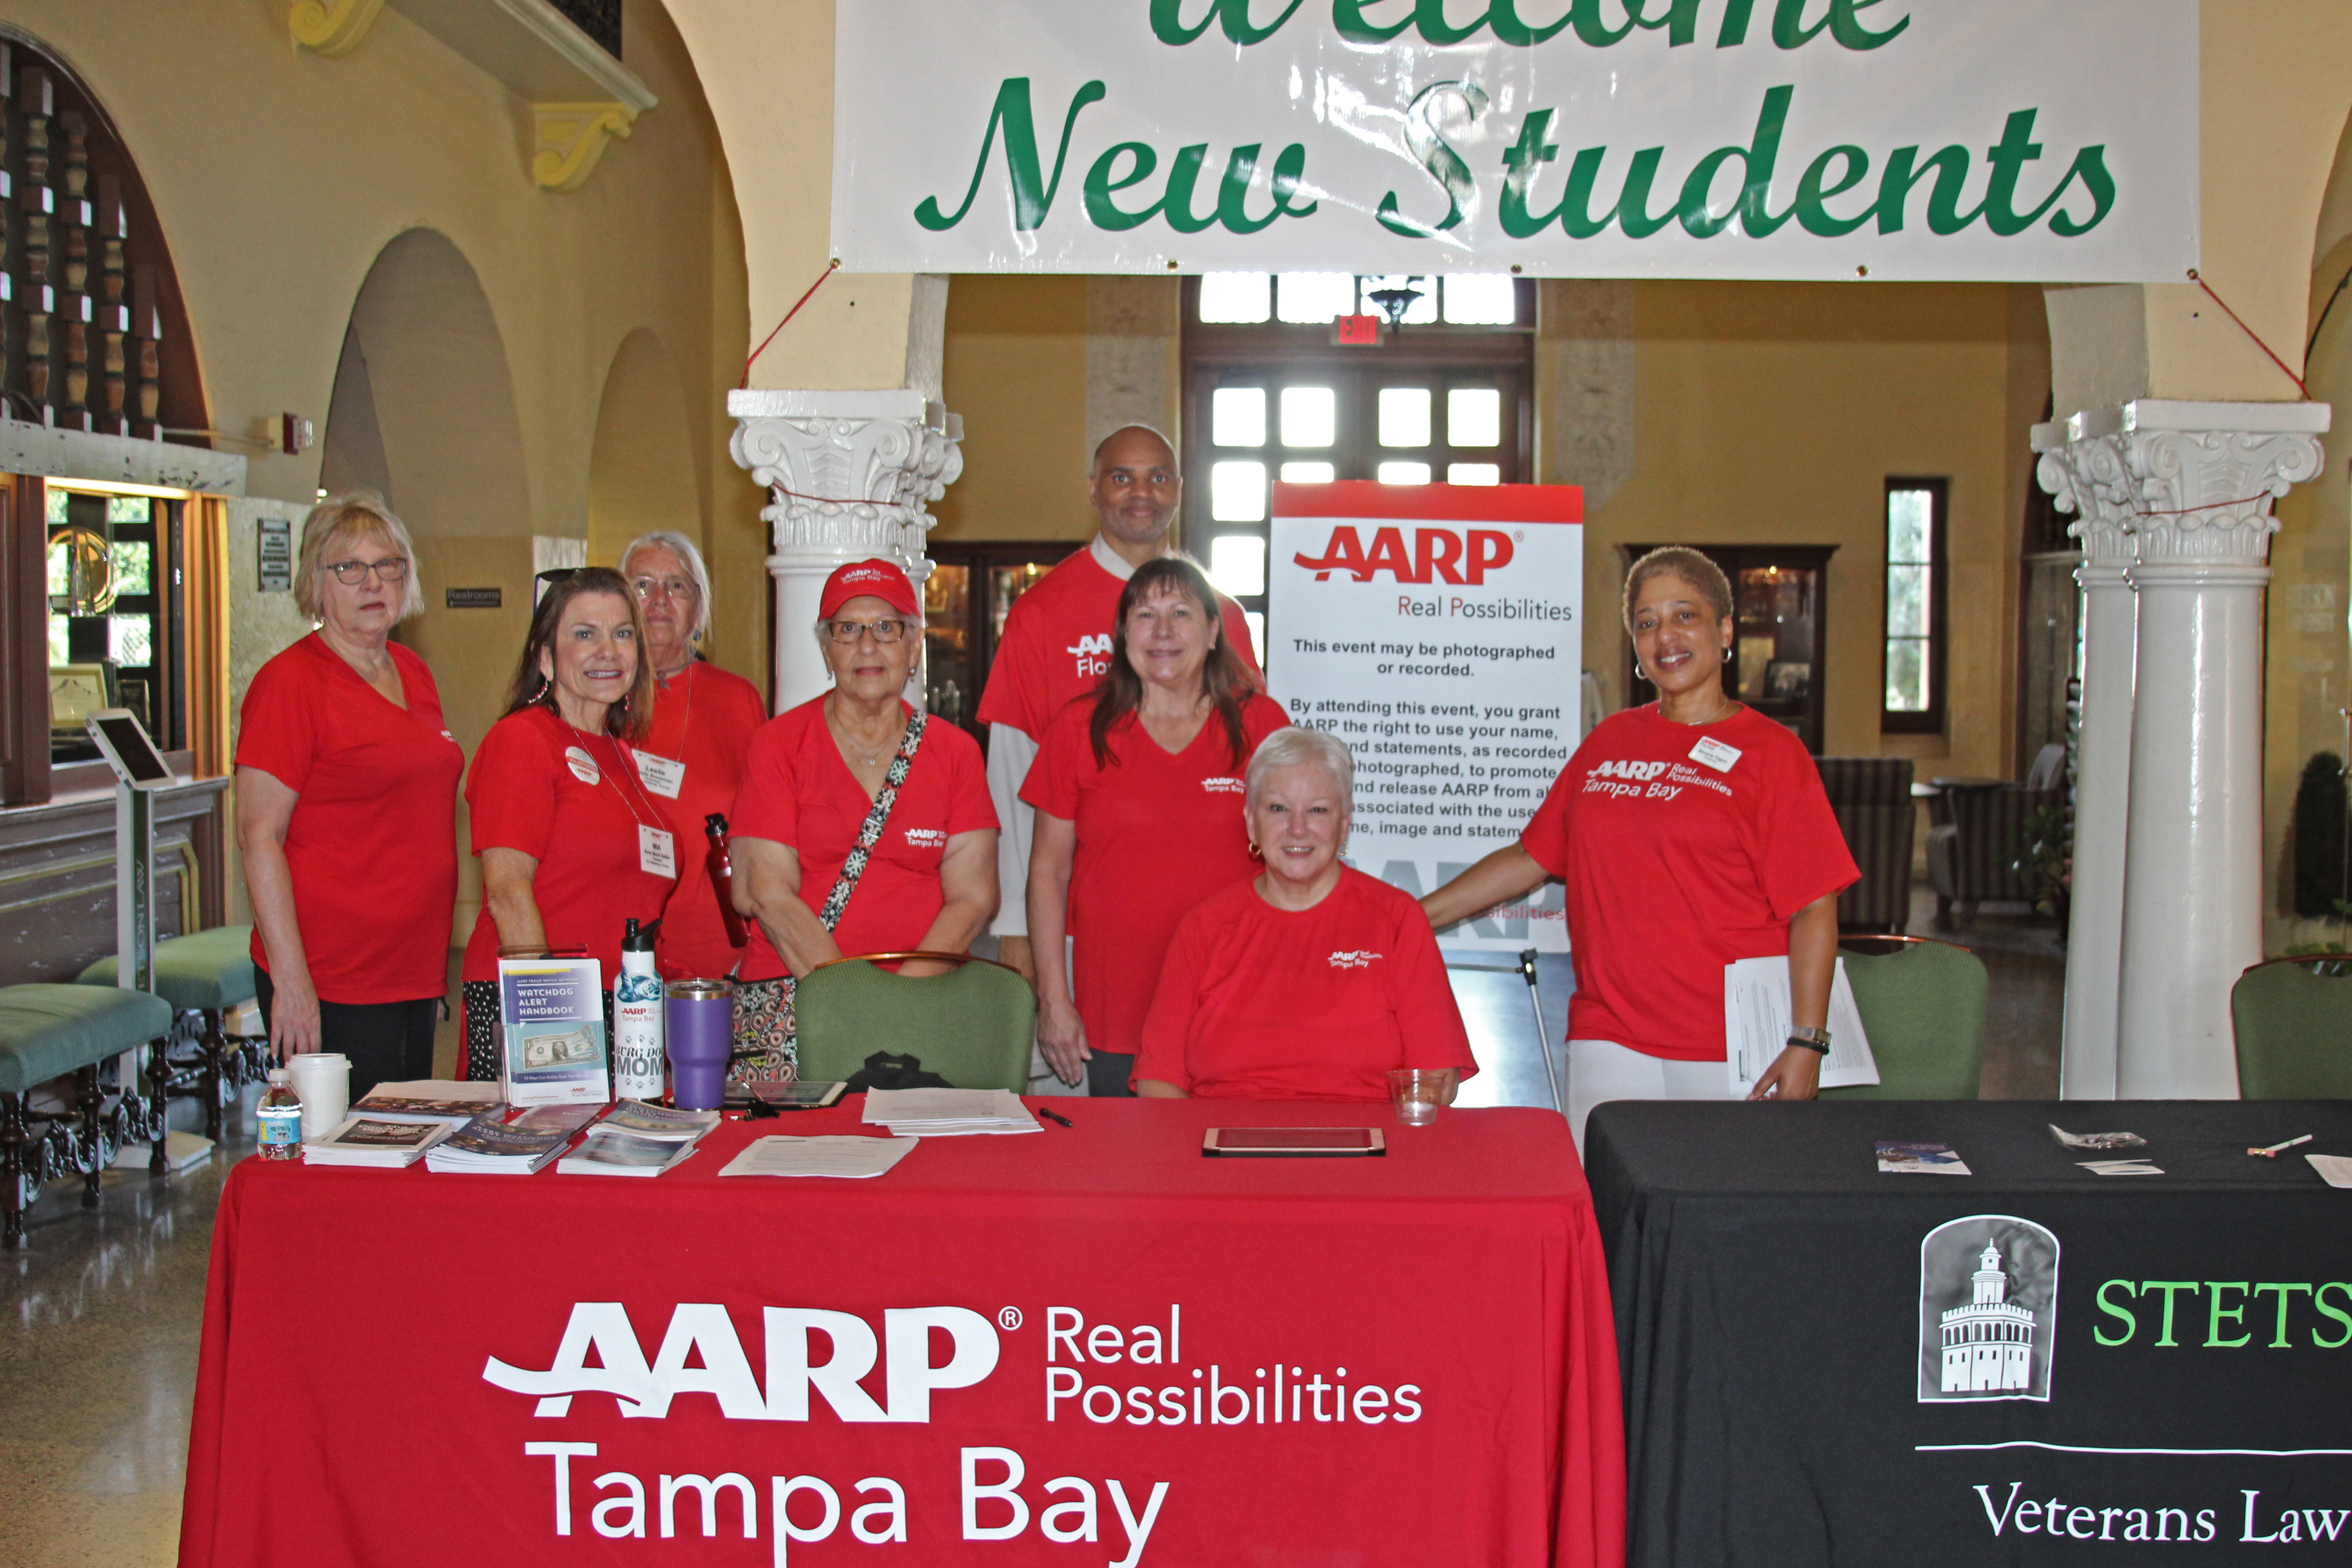 AARP Tampa Bay Team